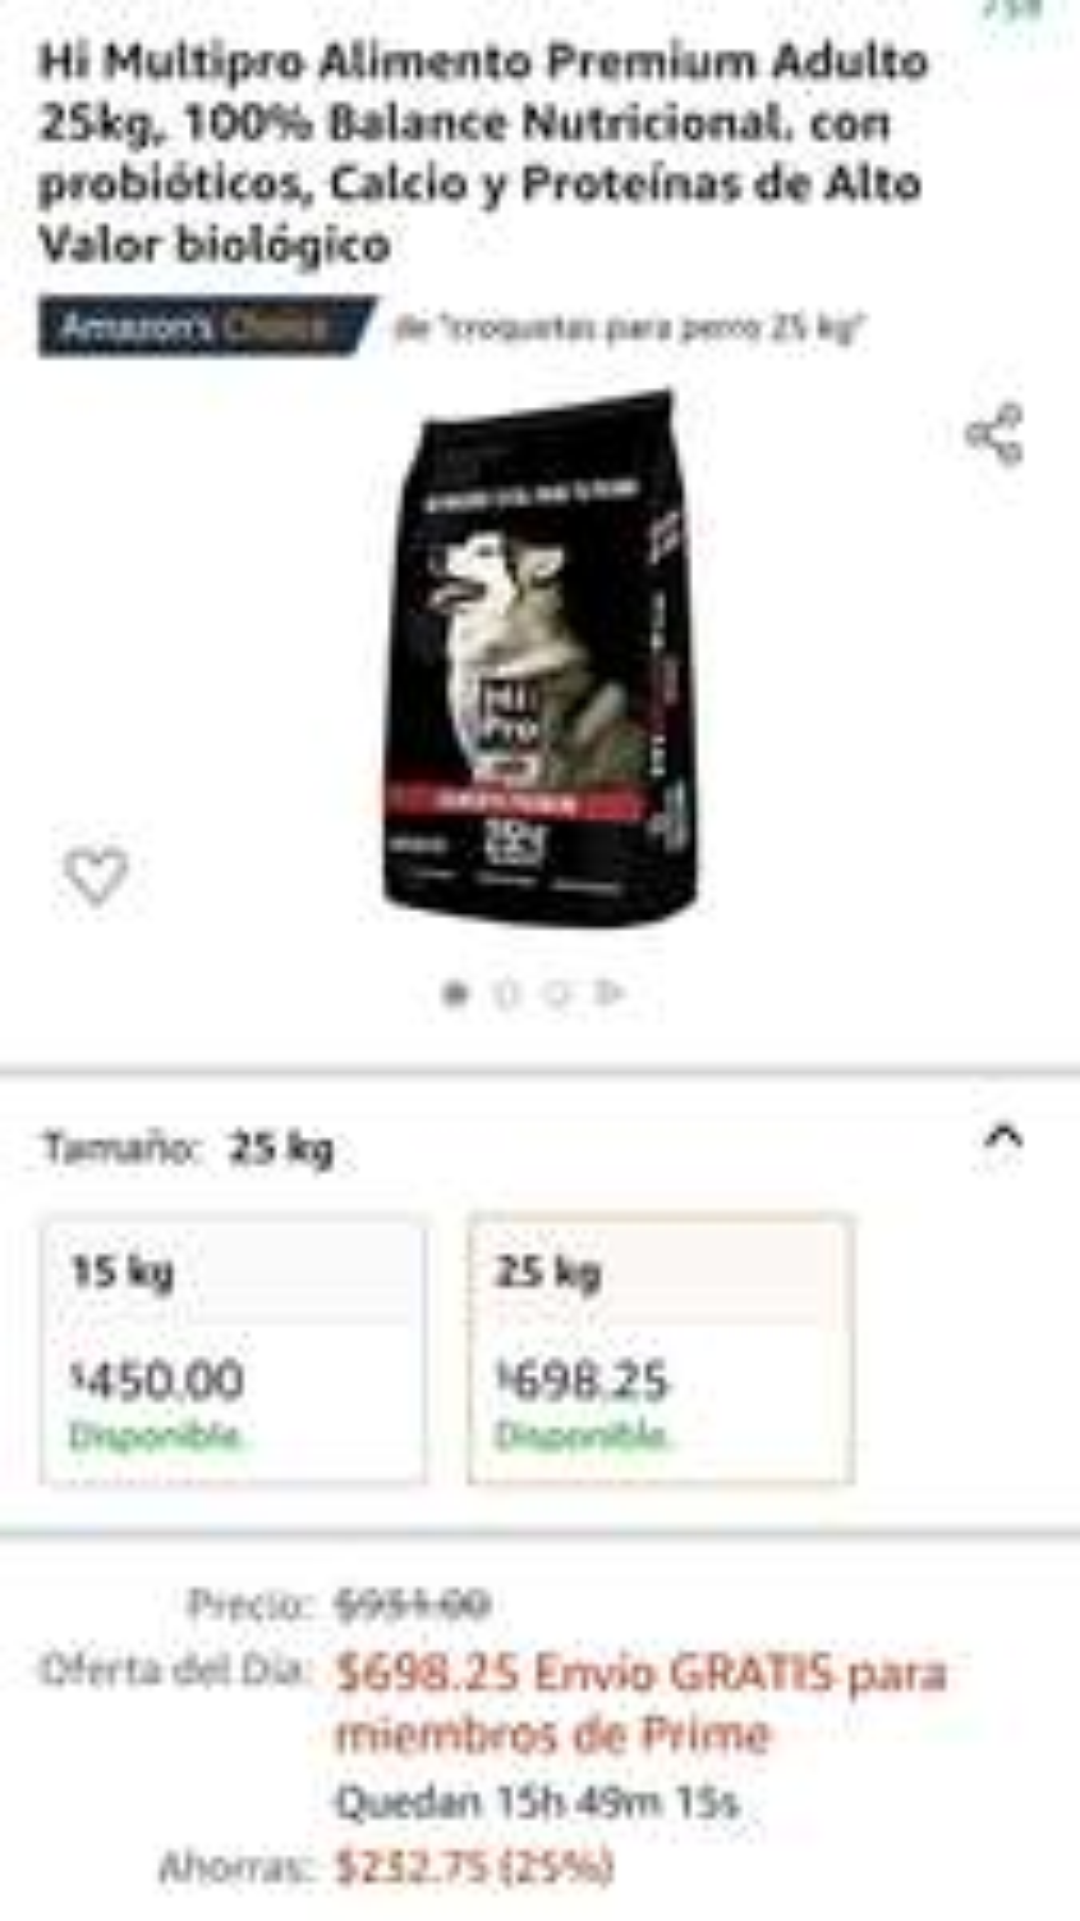 Amazon: Hi Multipro Alimento Premium Adulto 25kg Croquetas